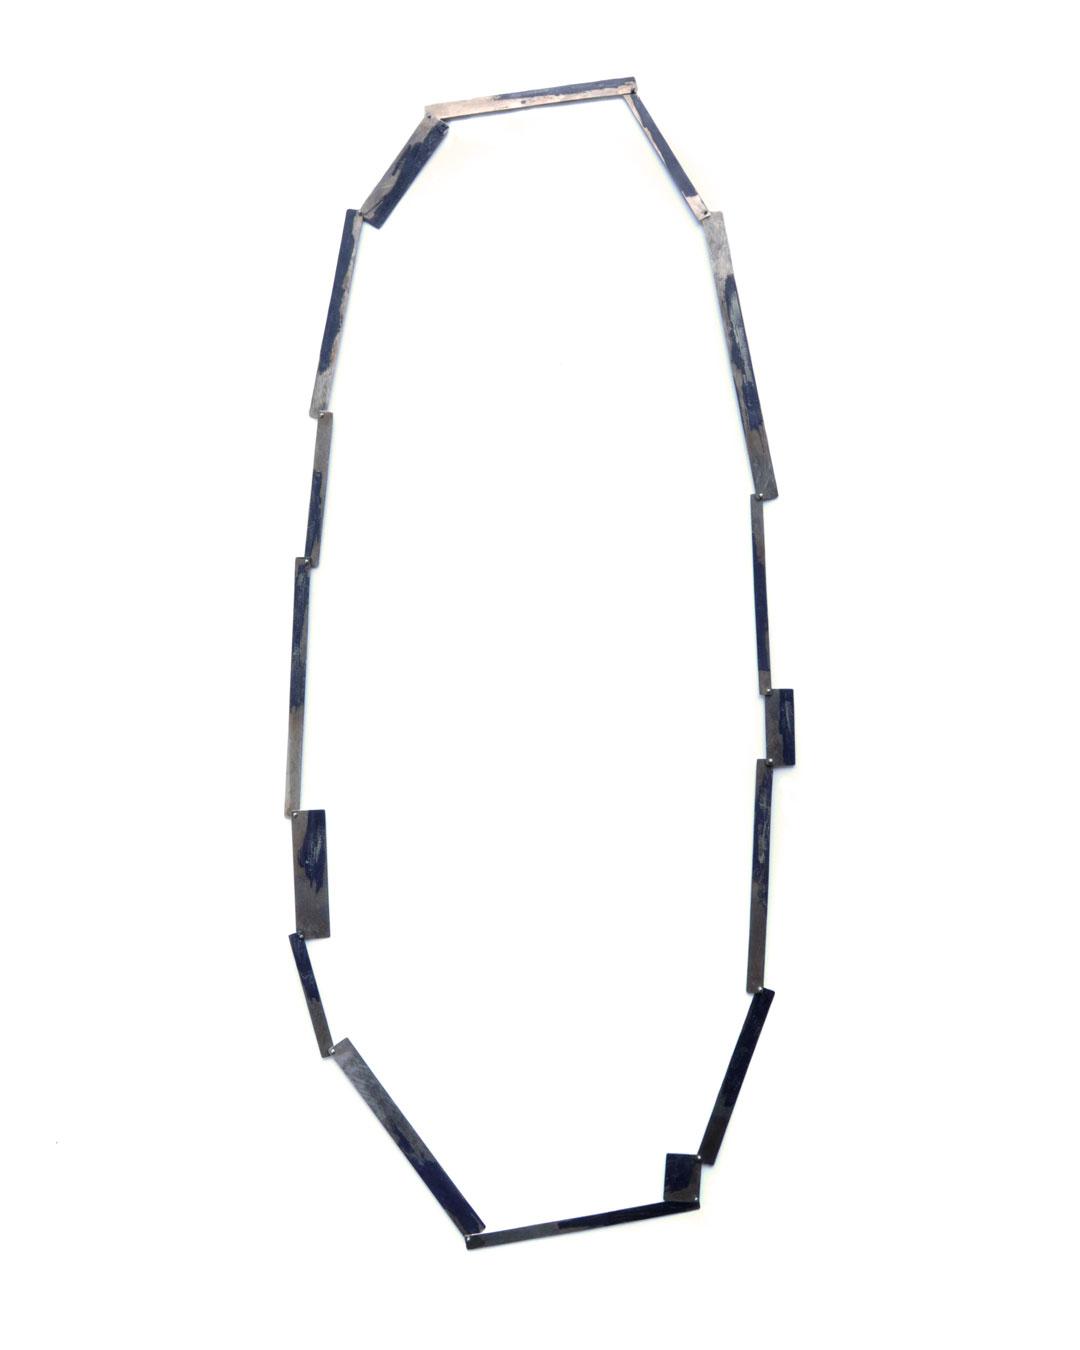 Graziano Visintin, untitled, 2000, necklace; white gold, niello, 420 x 120 mm, price on request